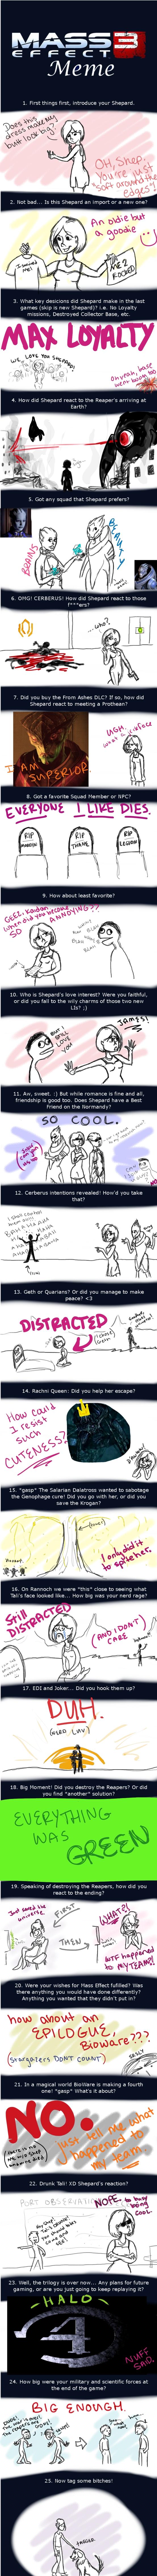 Mass Effect 3 Meme by Blossomsong